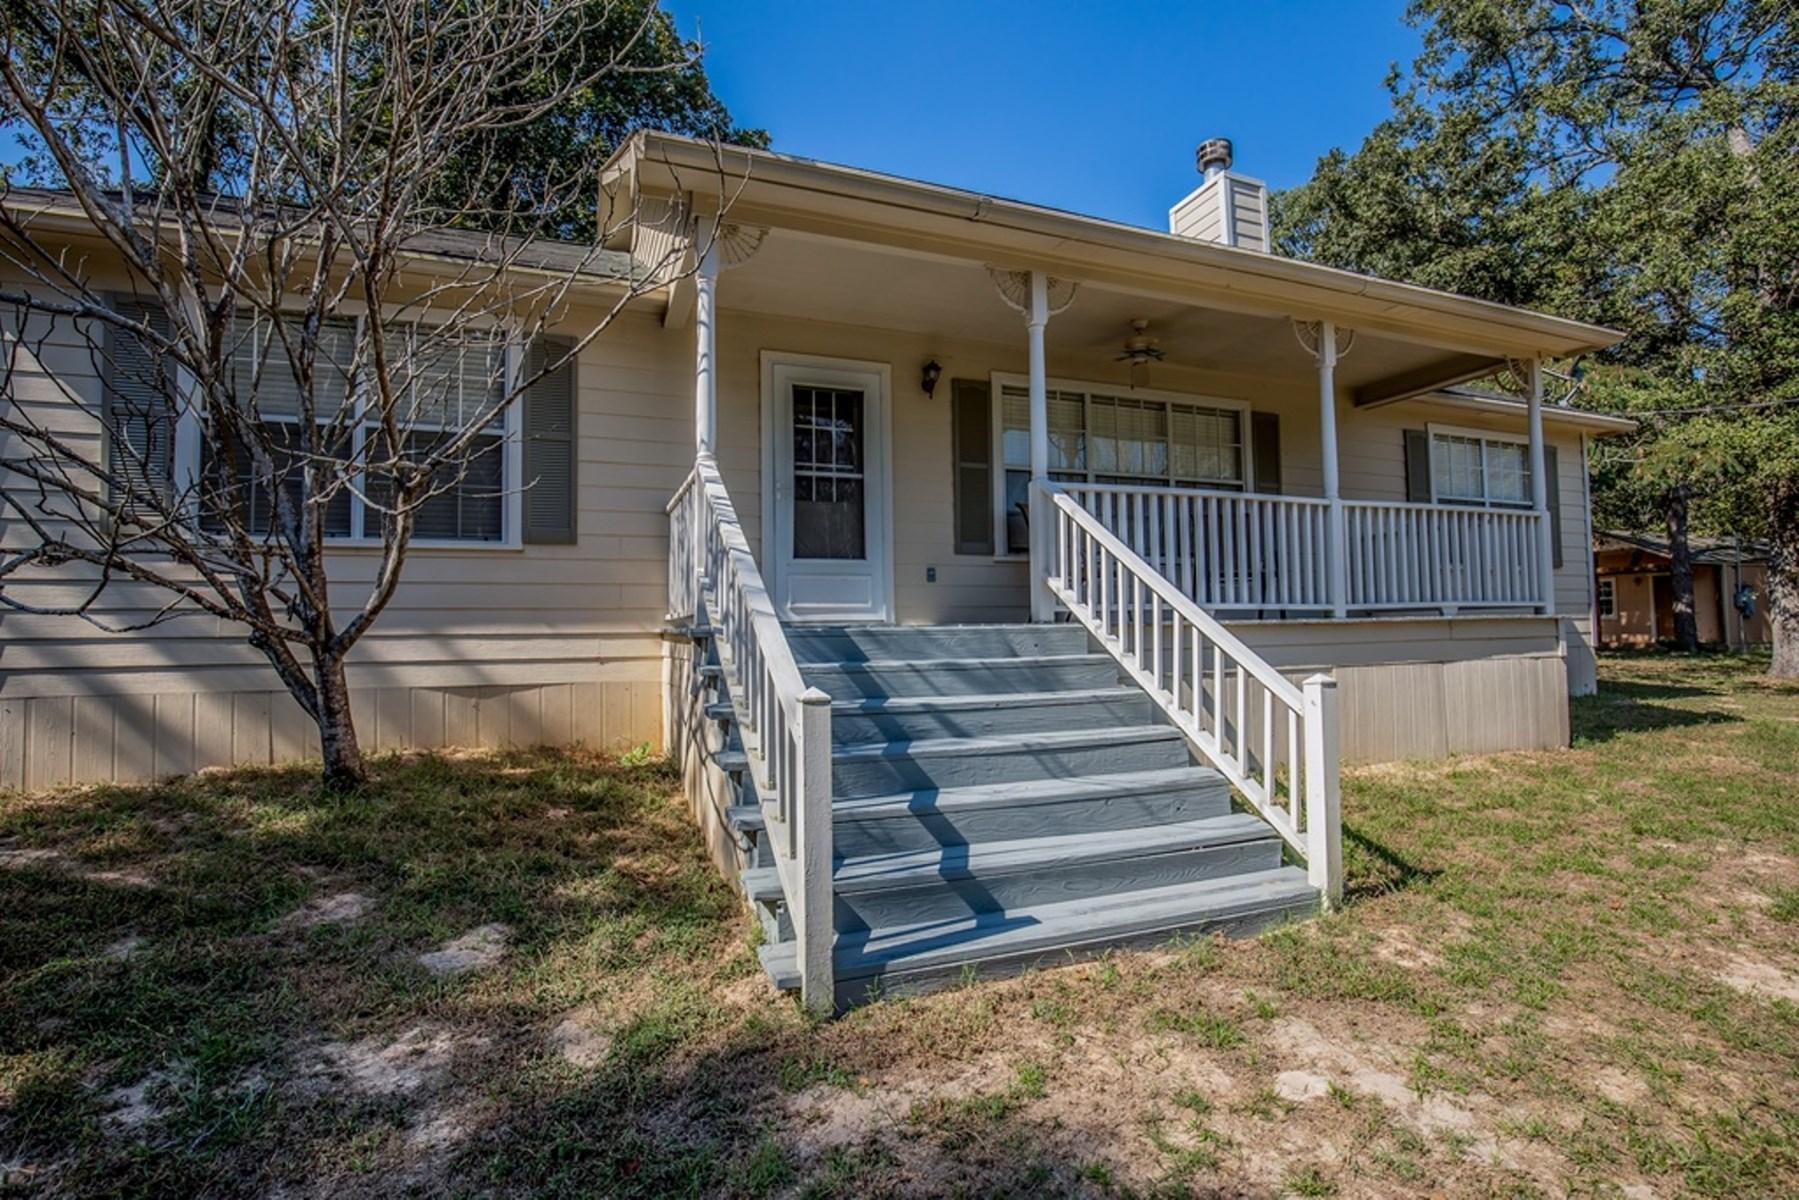 Country Cottage on Acreage - Oakwood, TX - Leon County, TX